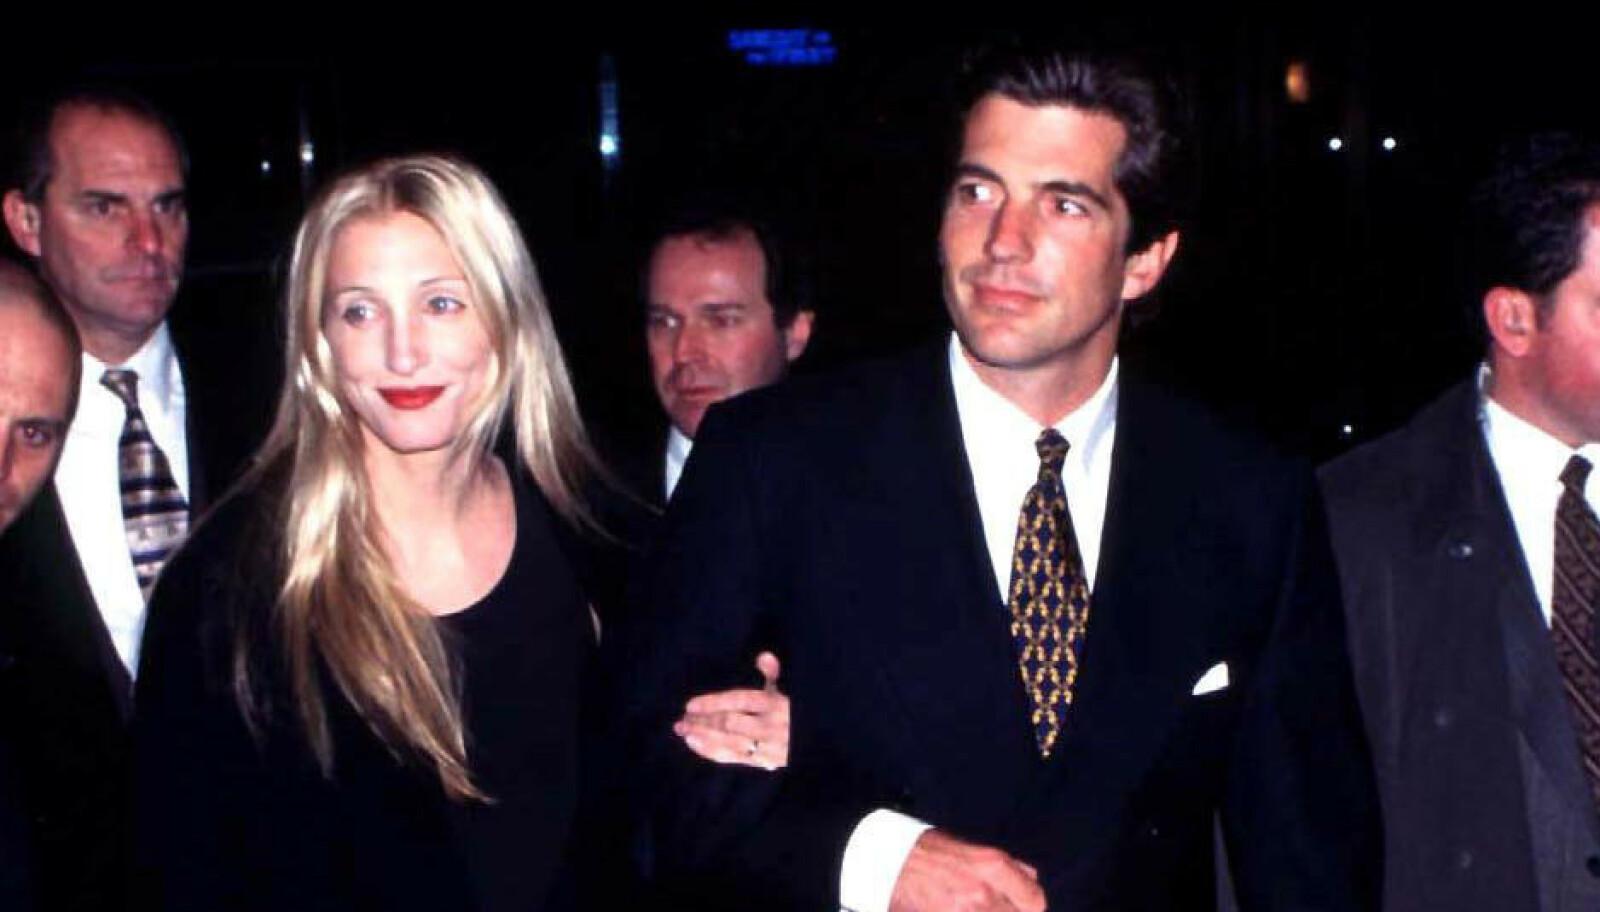 JFK JR. OG CAROLYN BESSETTE: De ble regnet for å være 90-tallets hotteste par. Så styrtet småflyet han flydde Dette bildet er fra 1999. FOTO: NTB scanpix